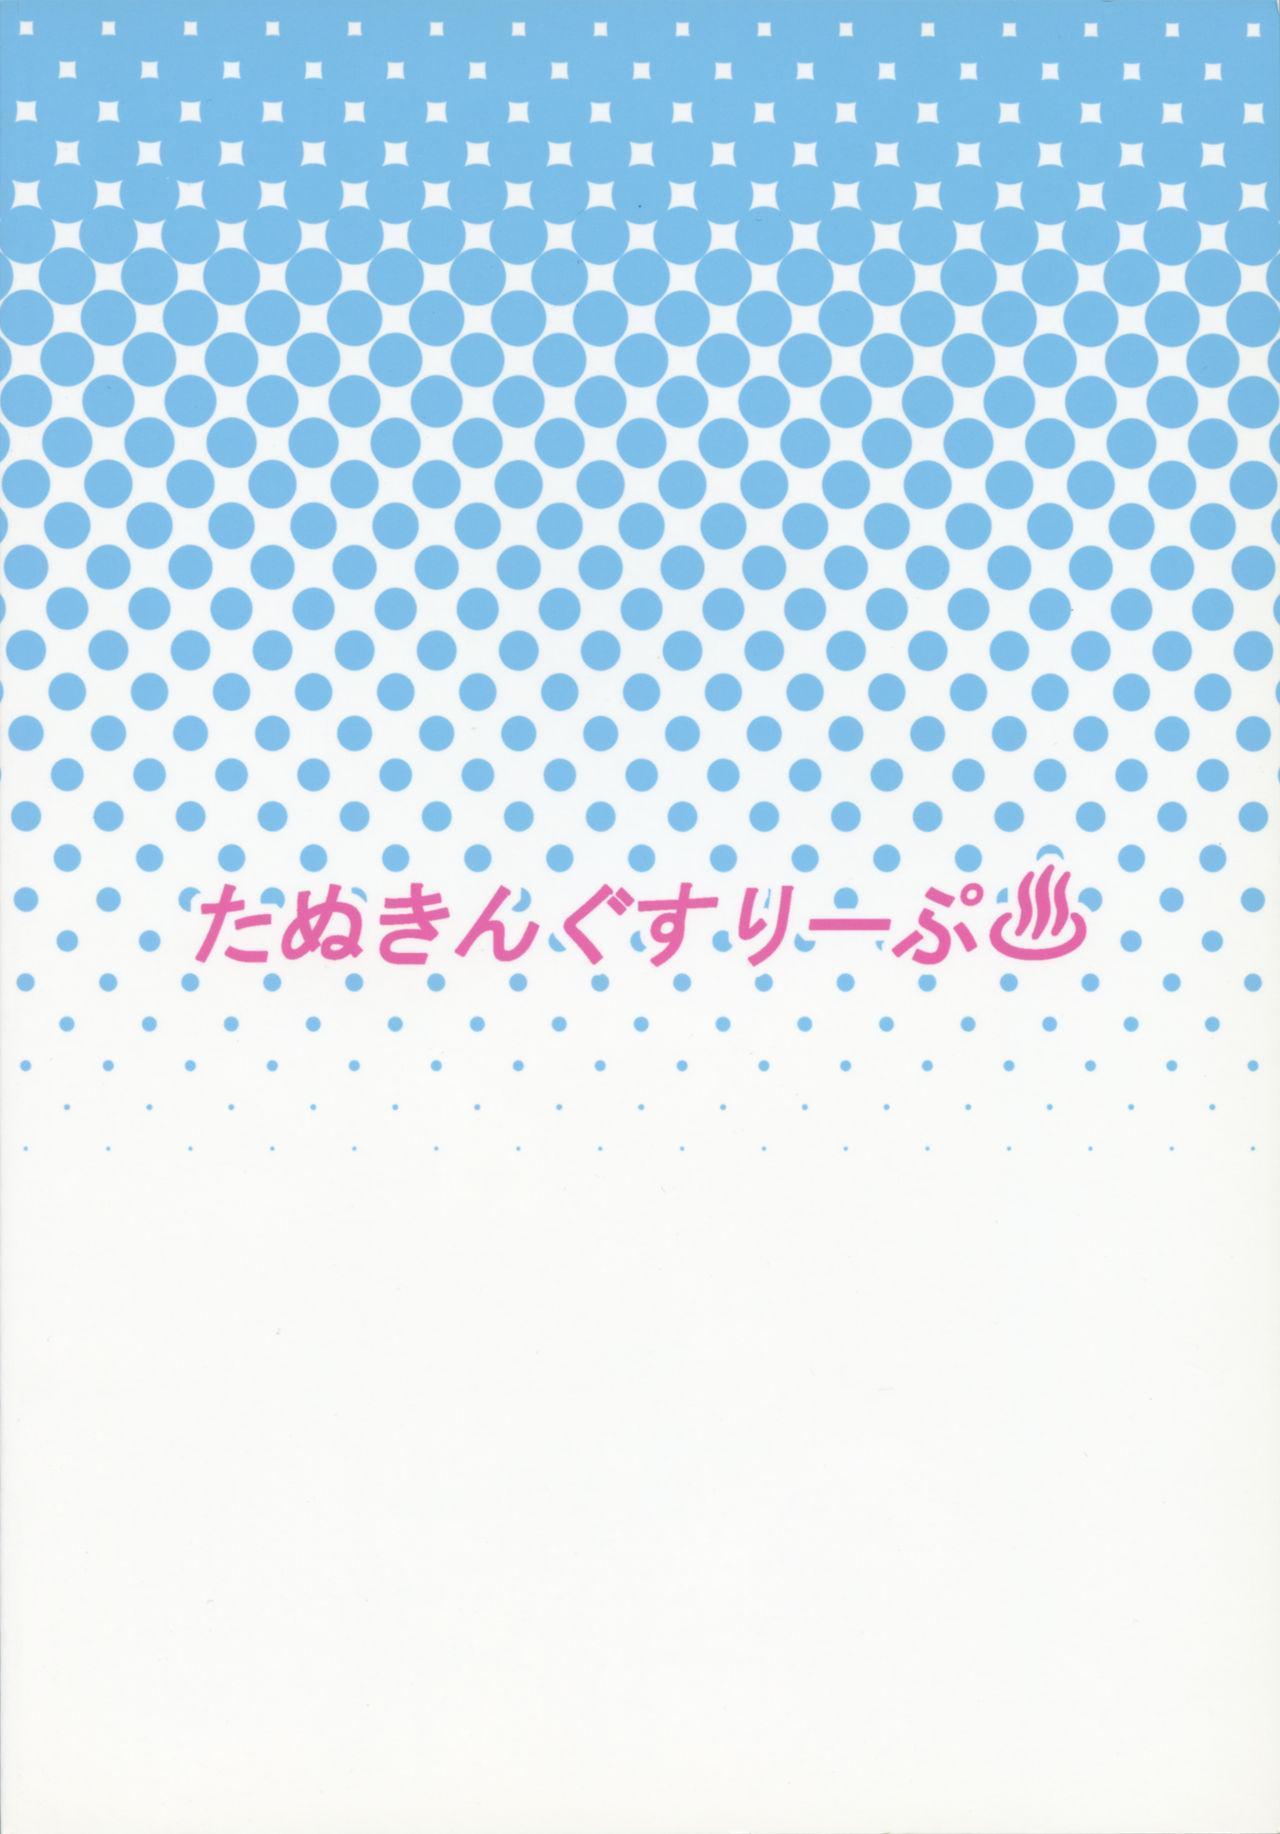 Chijo Risu Koubi Onsen 21